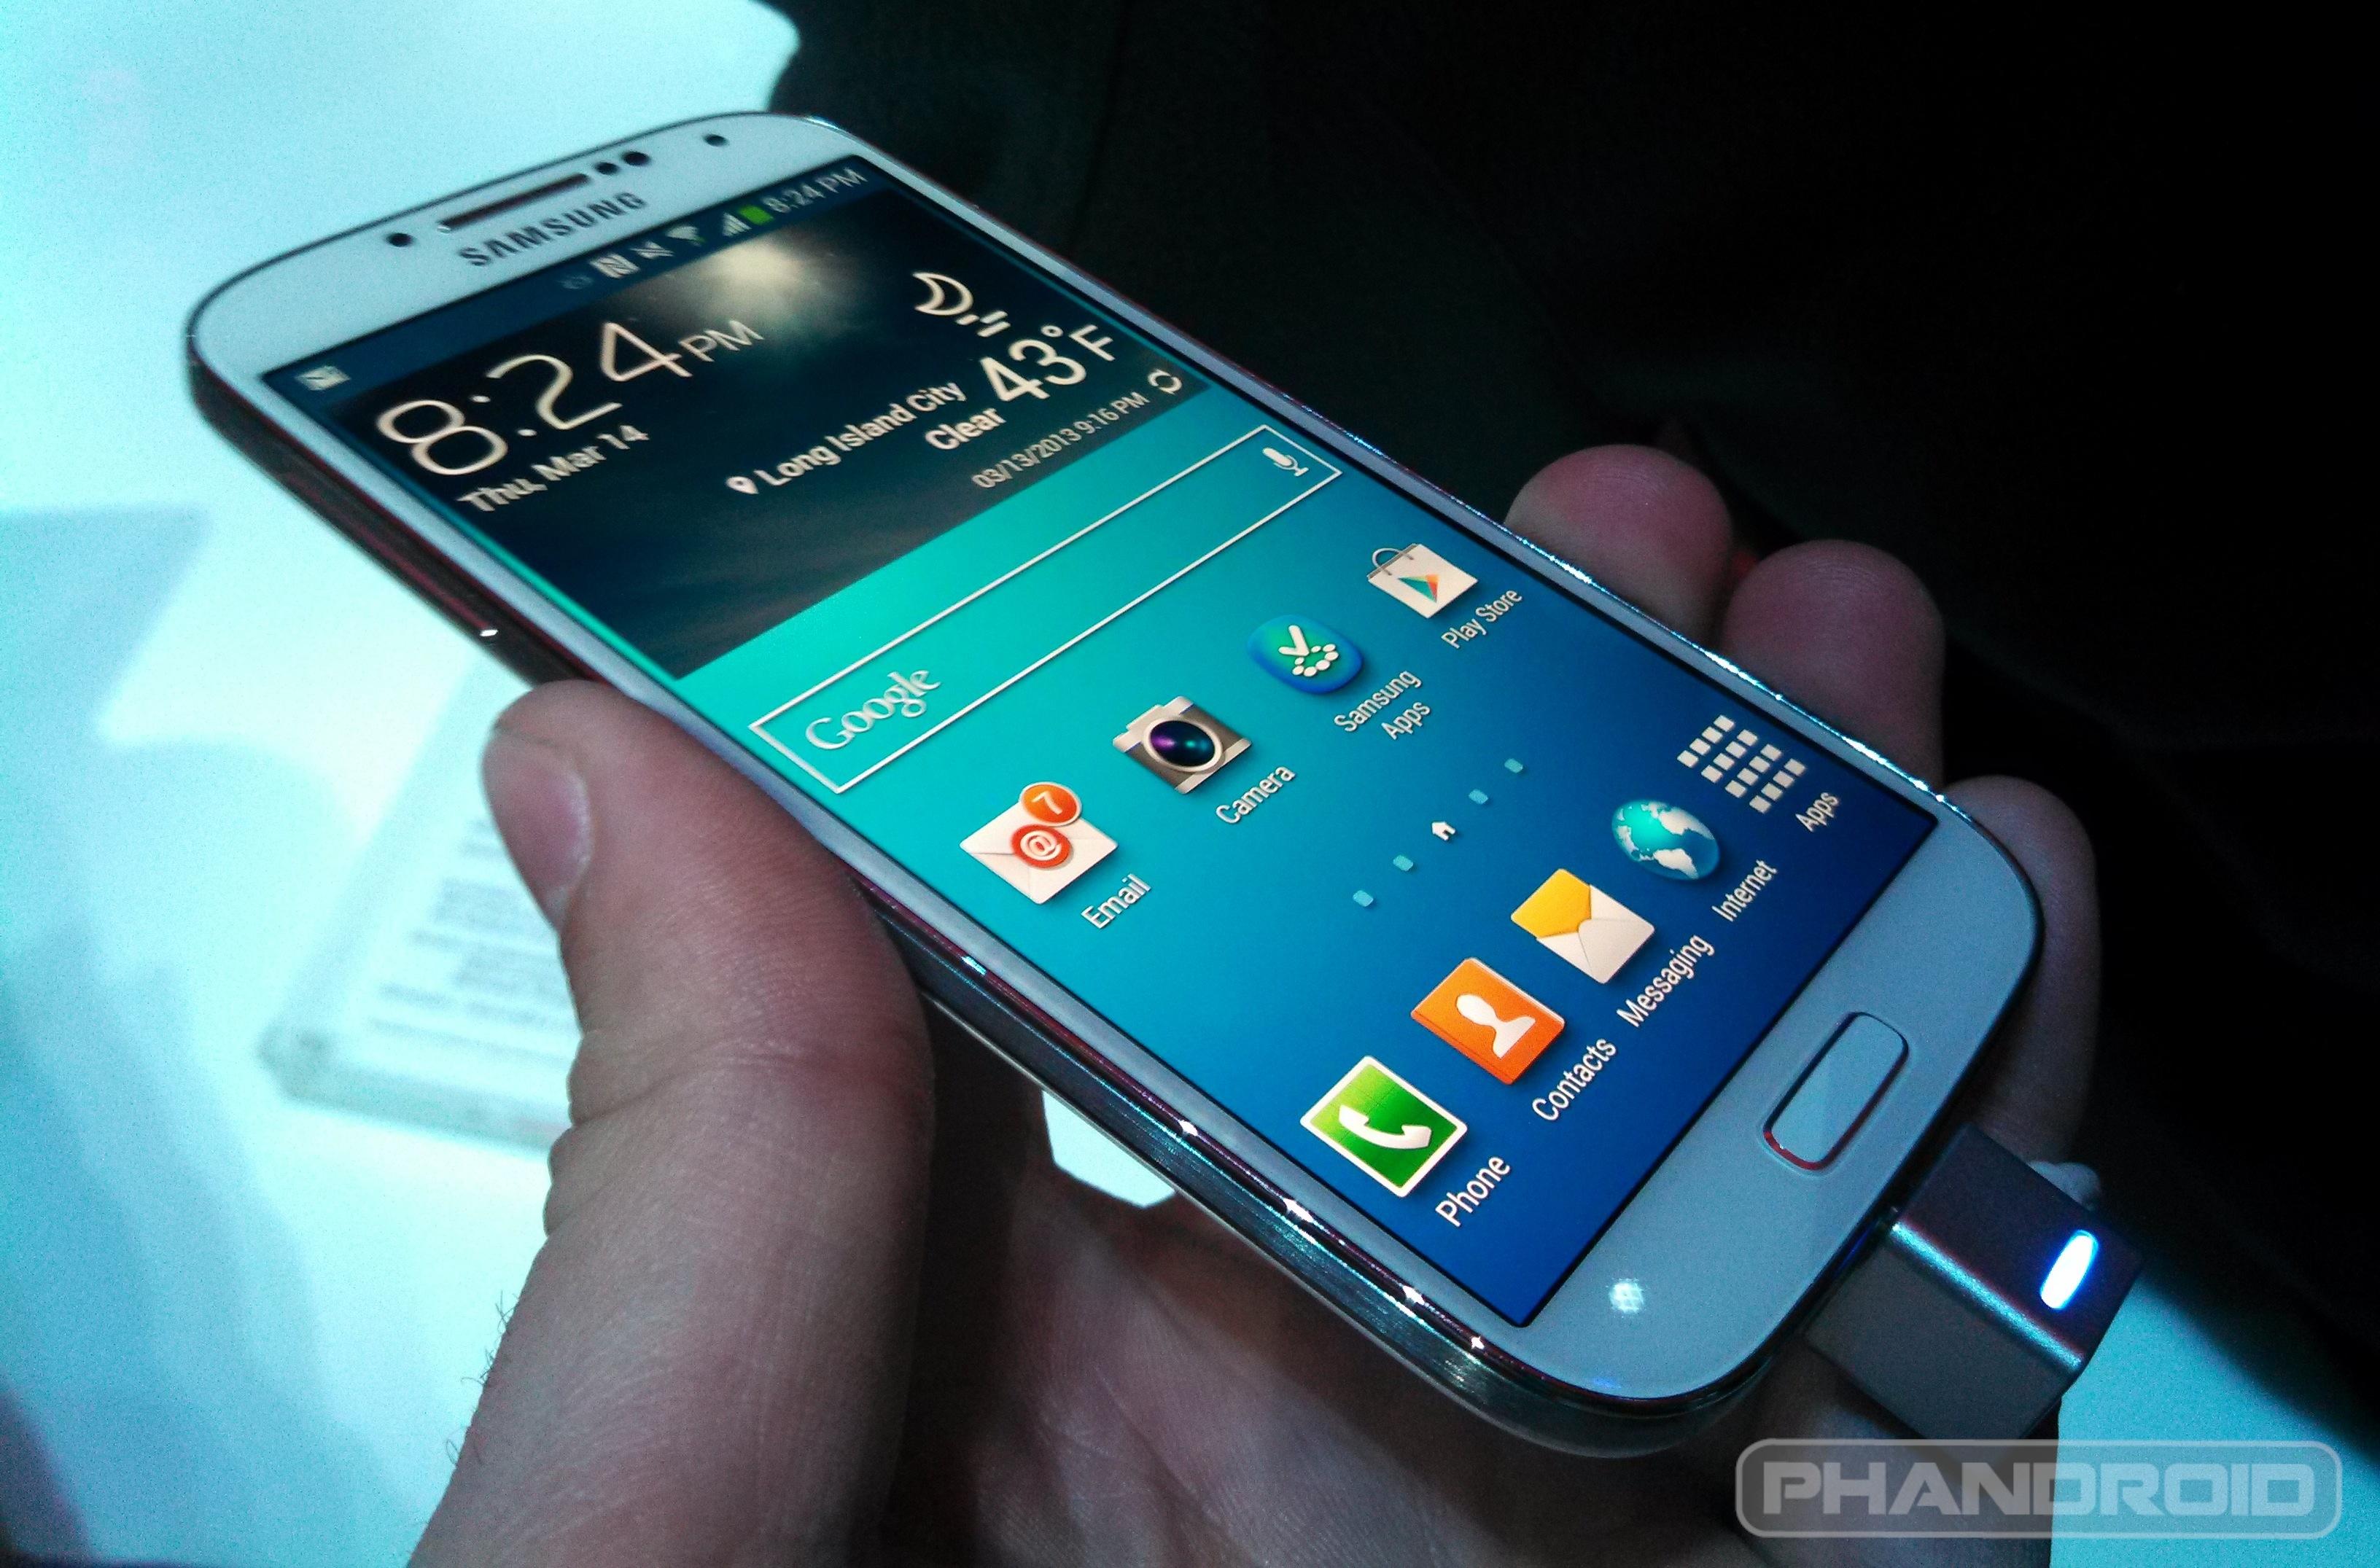 Samsung Galaxy S4: Классический дизайн и